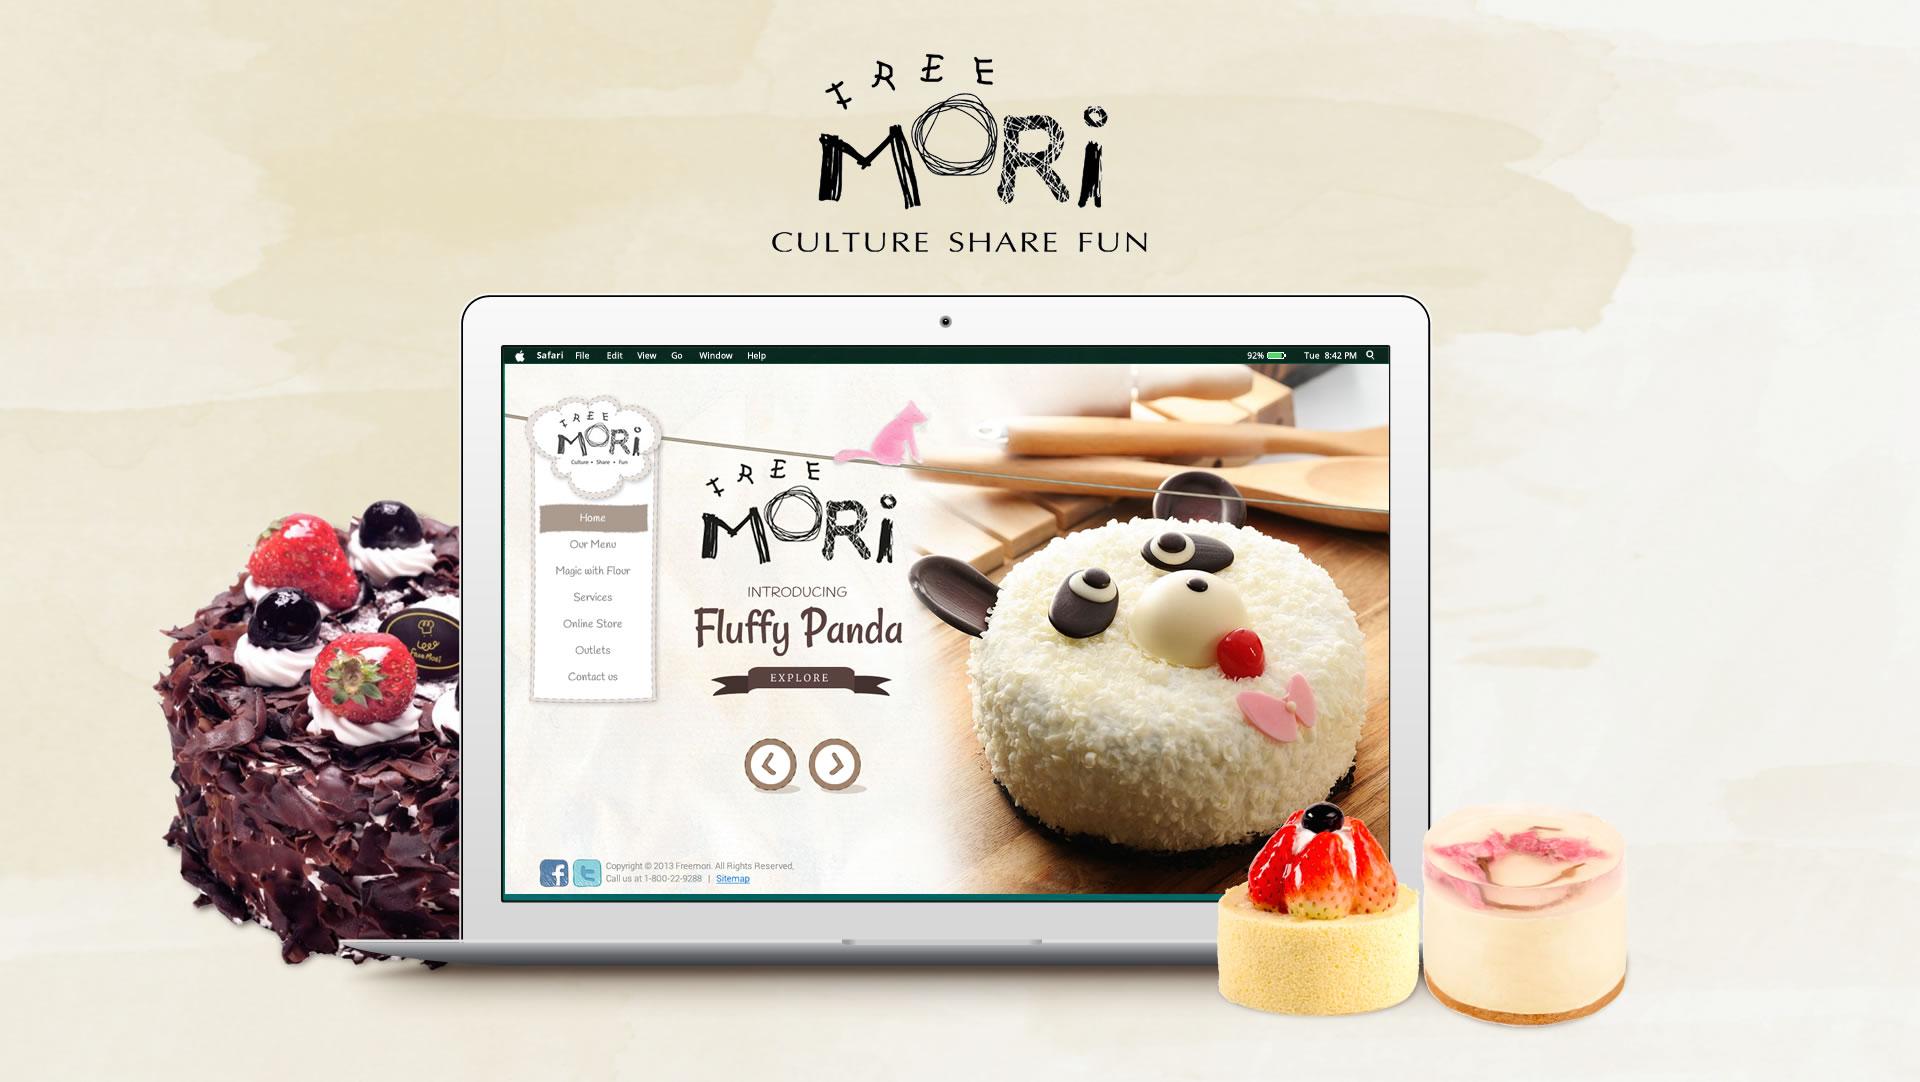 Freemori Malaysia website design